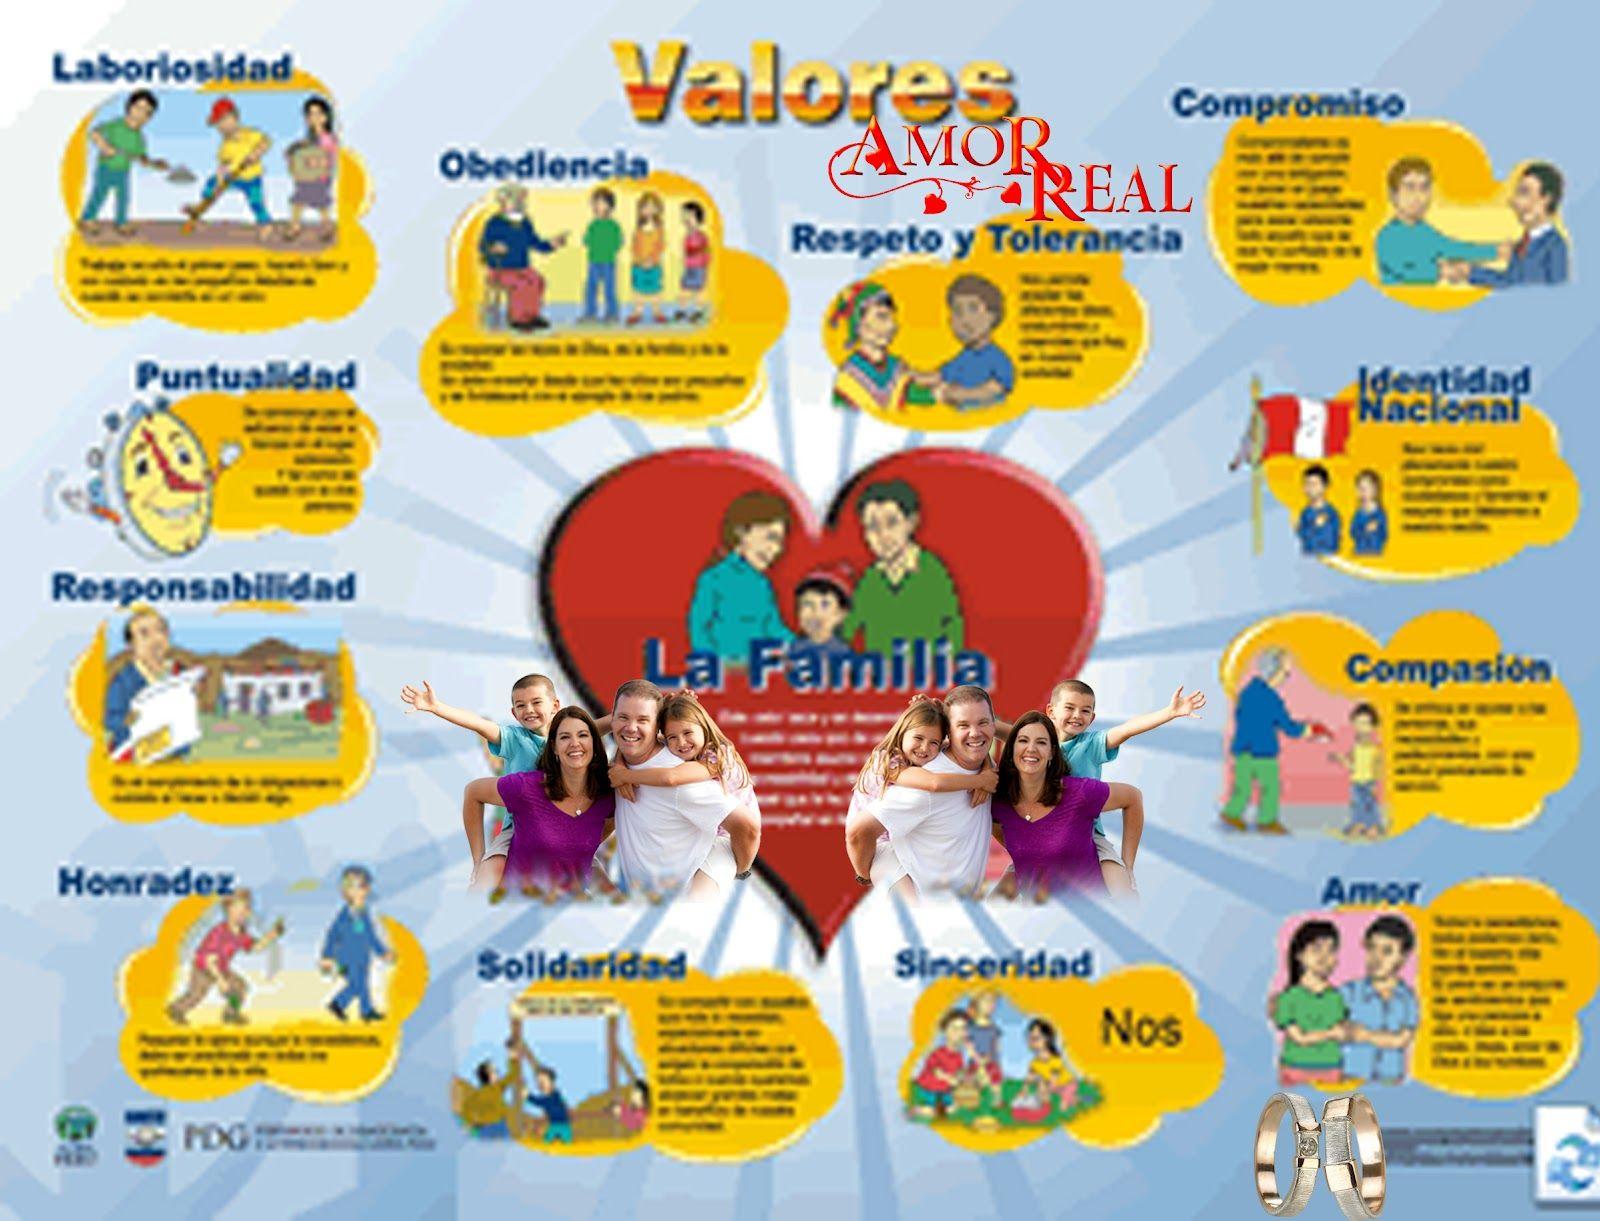 29 de julio recordamos los Valores Humanos http://www.yoespiritual ...